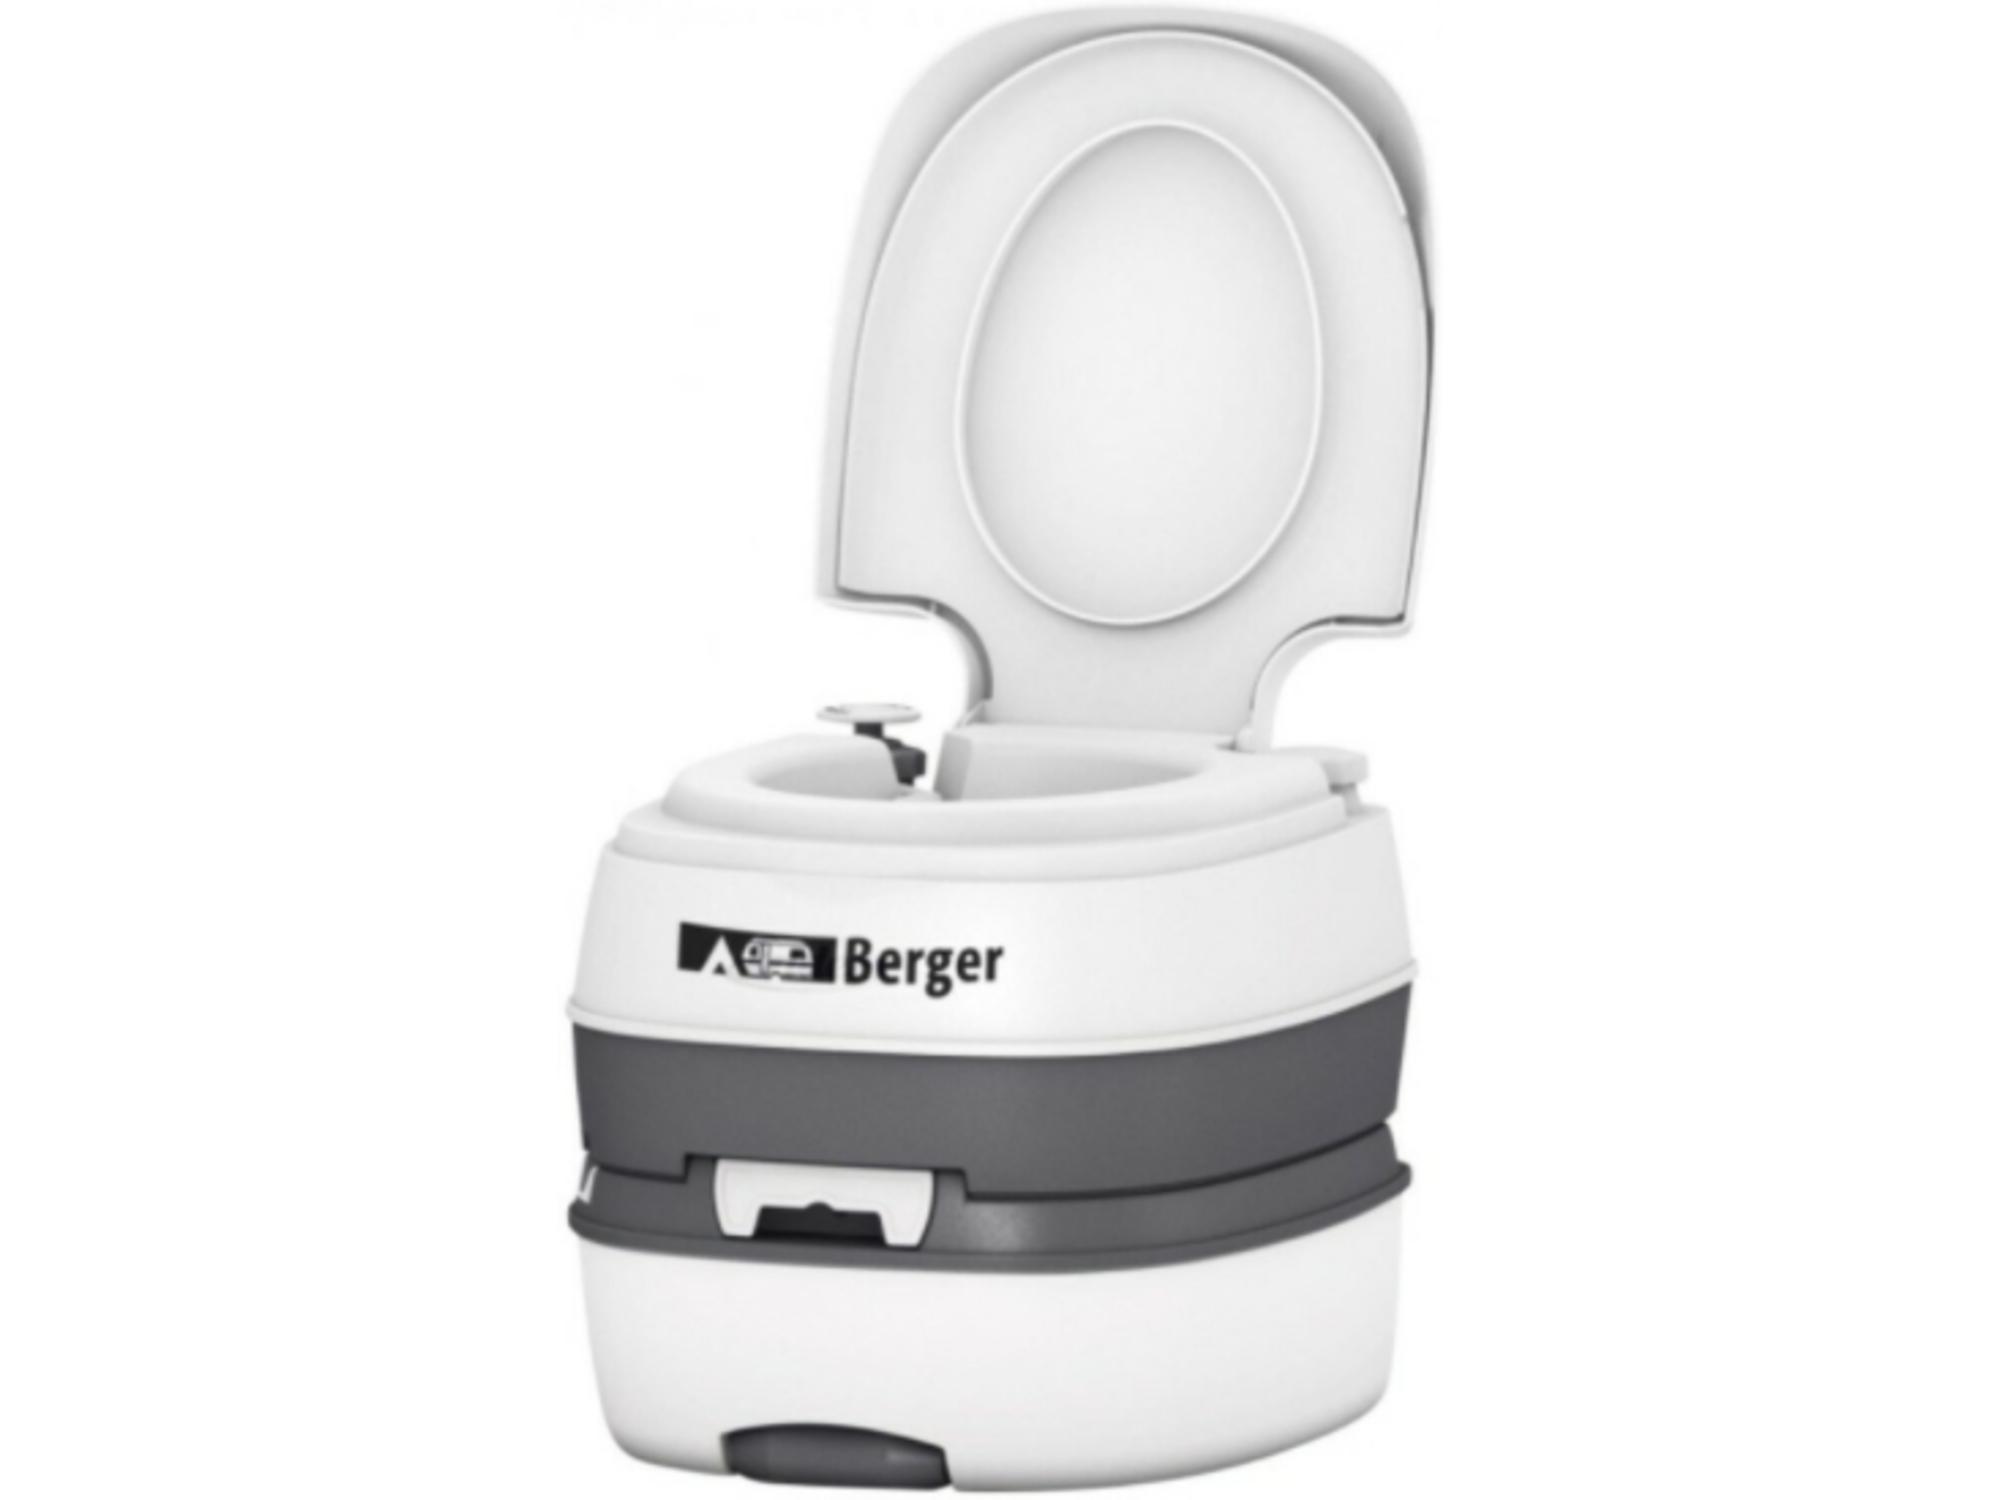 BERGER kemični WC Deluxe 13366 - ODPRTA EMBALAŽA